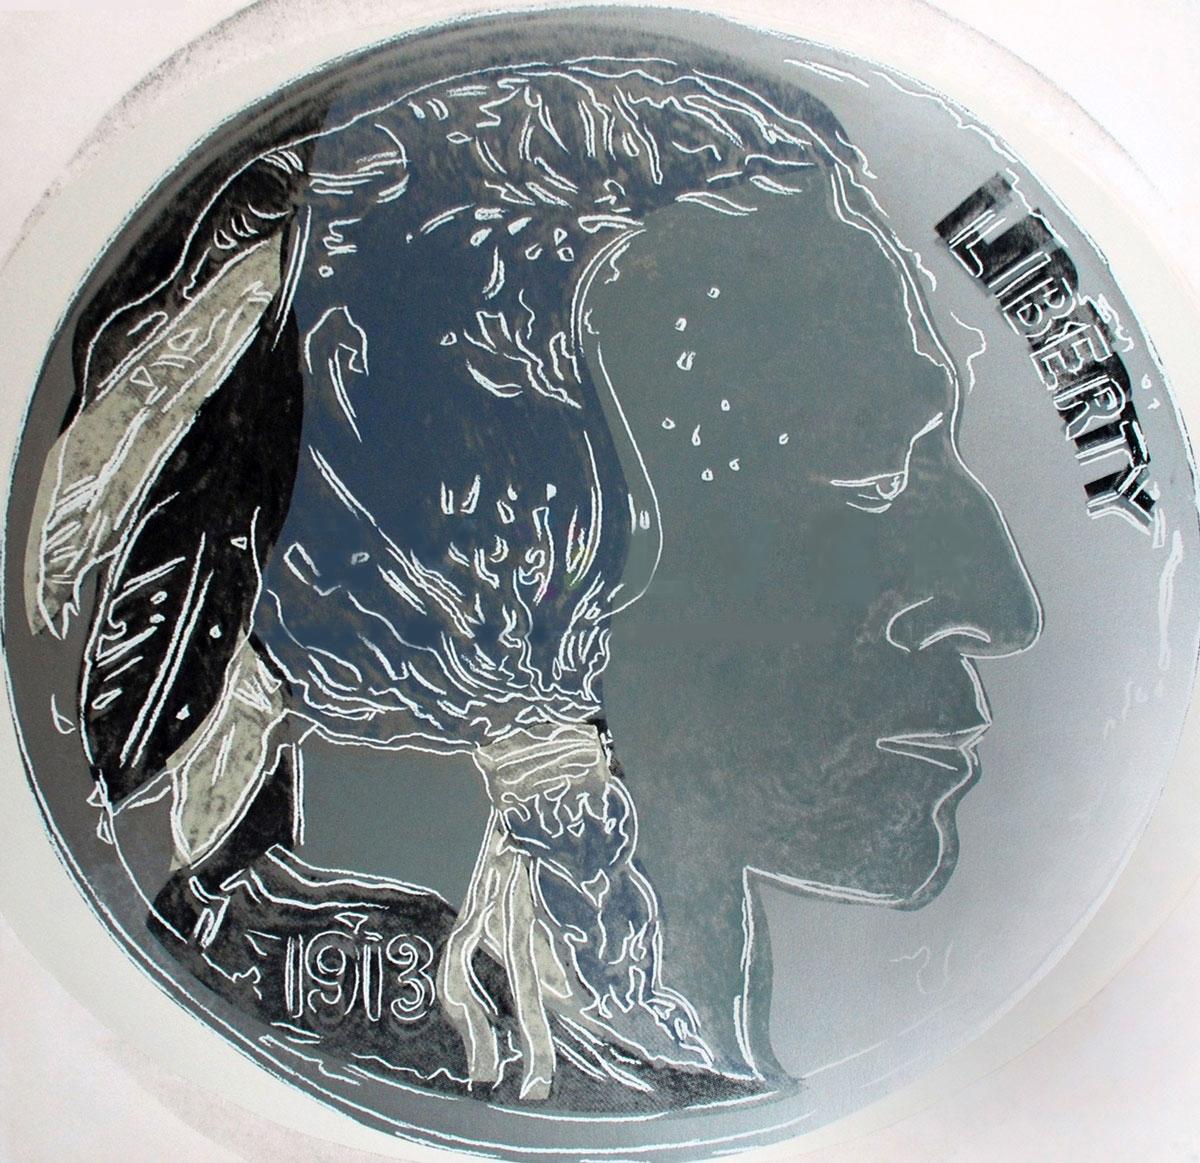 Indian Head Nickel (fs Ii.385) by Andy Warhol